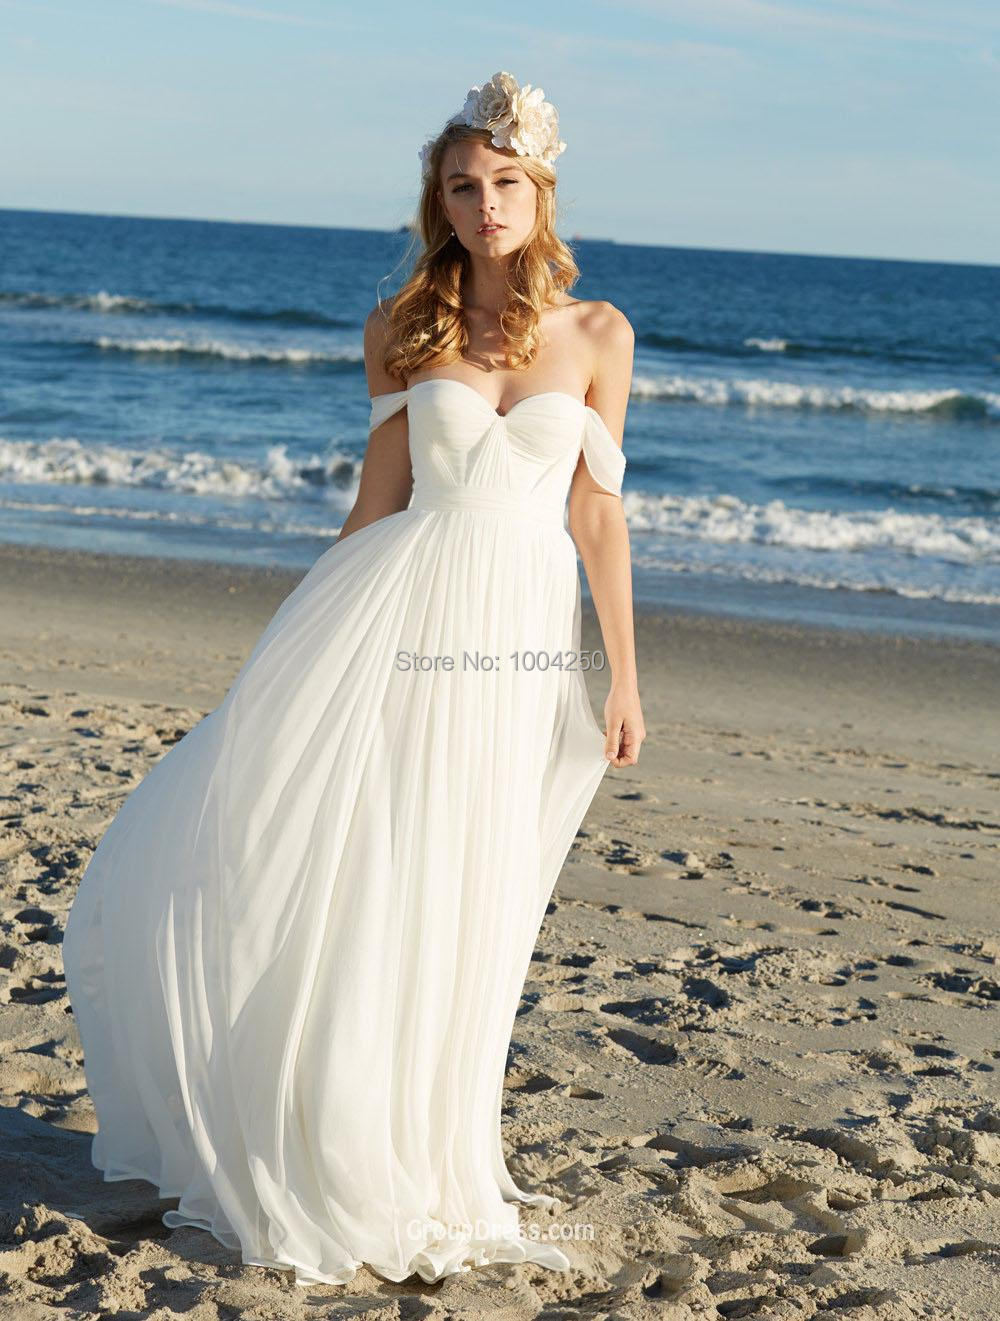 simple beach style wedding dresses simple beach wedding dresses Simple Beach Wedding Dresses